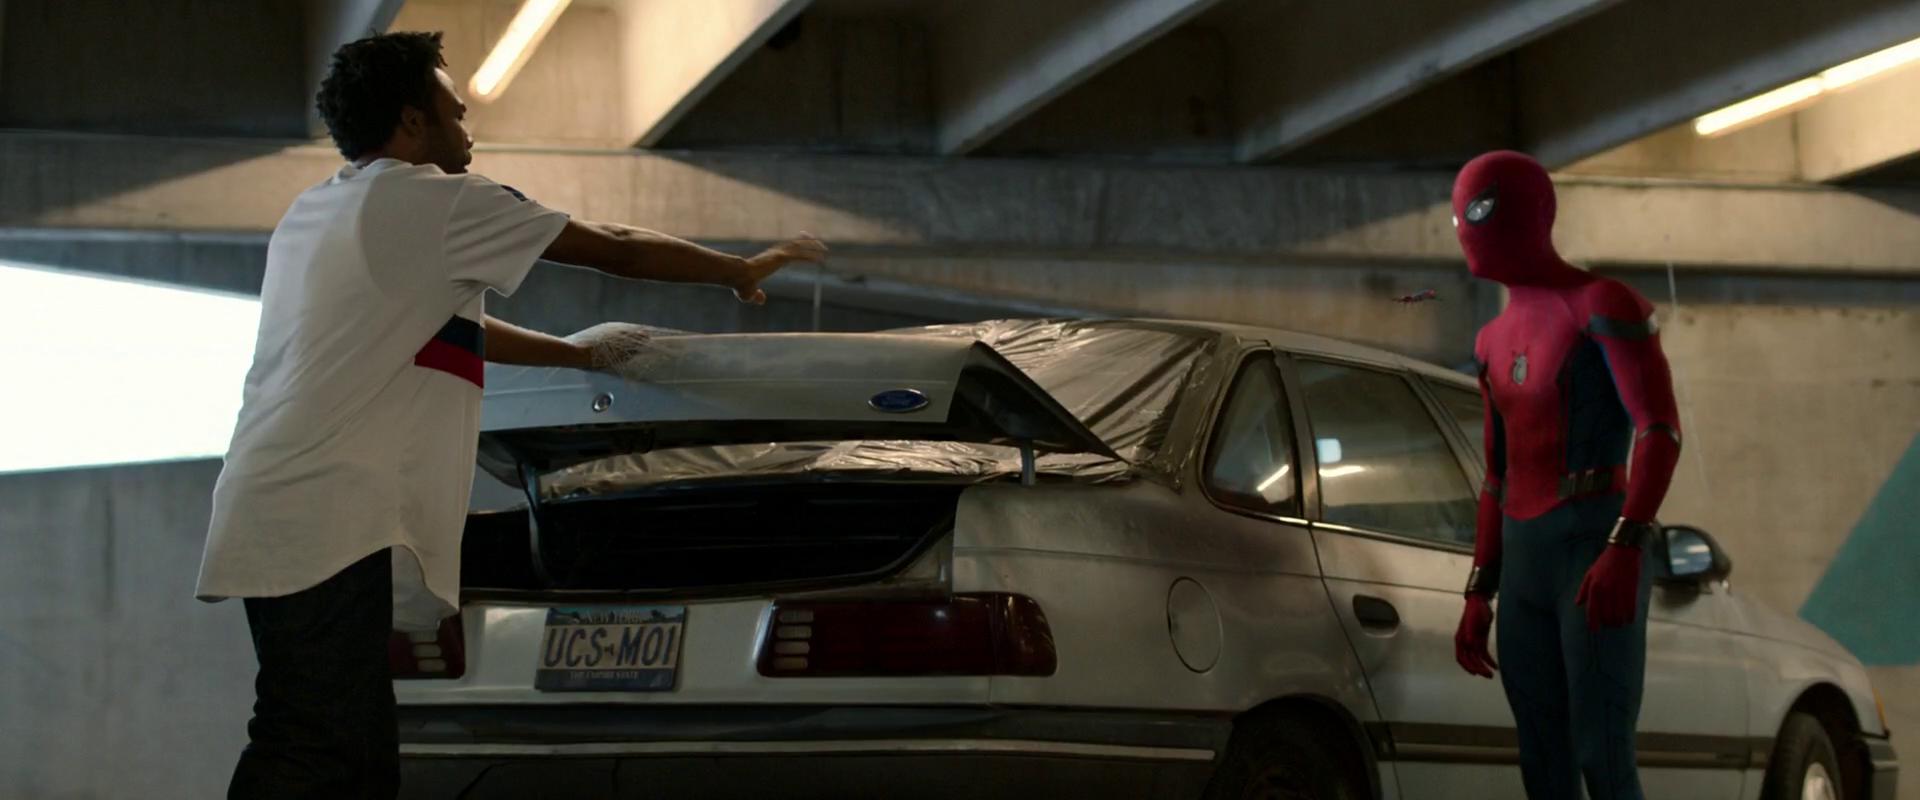 spider-man_interrogating_prowler_queens_parking_garage.png